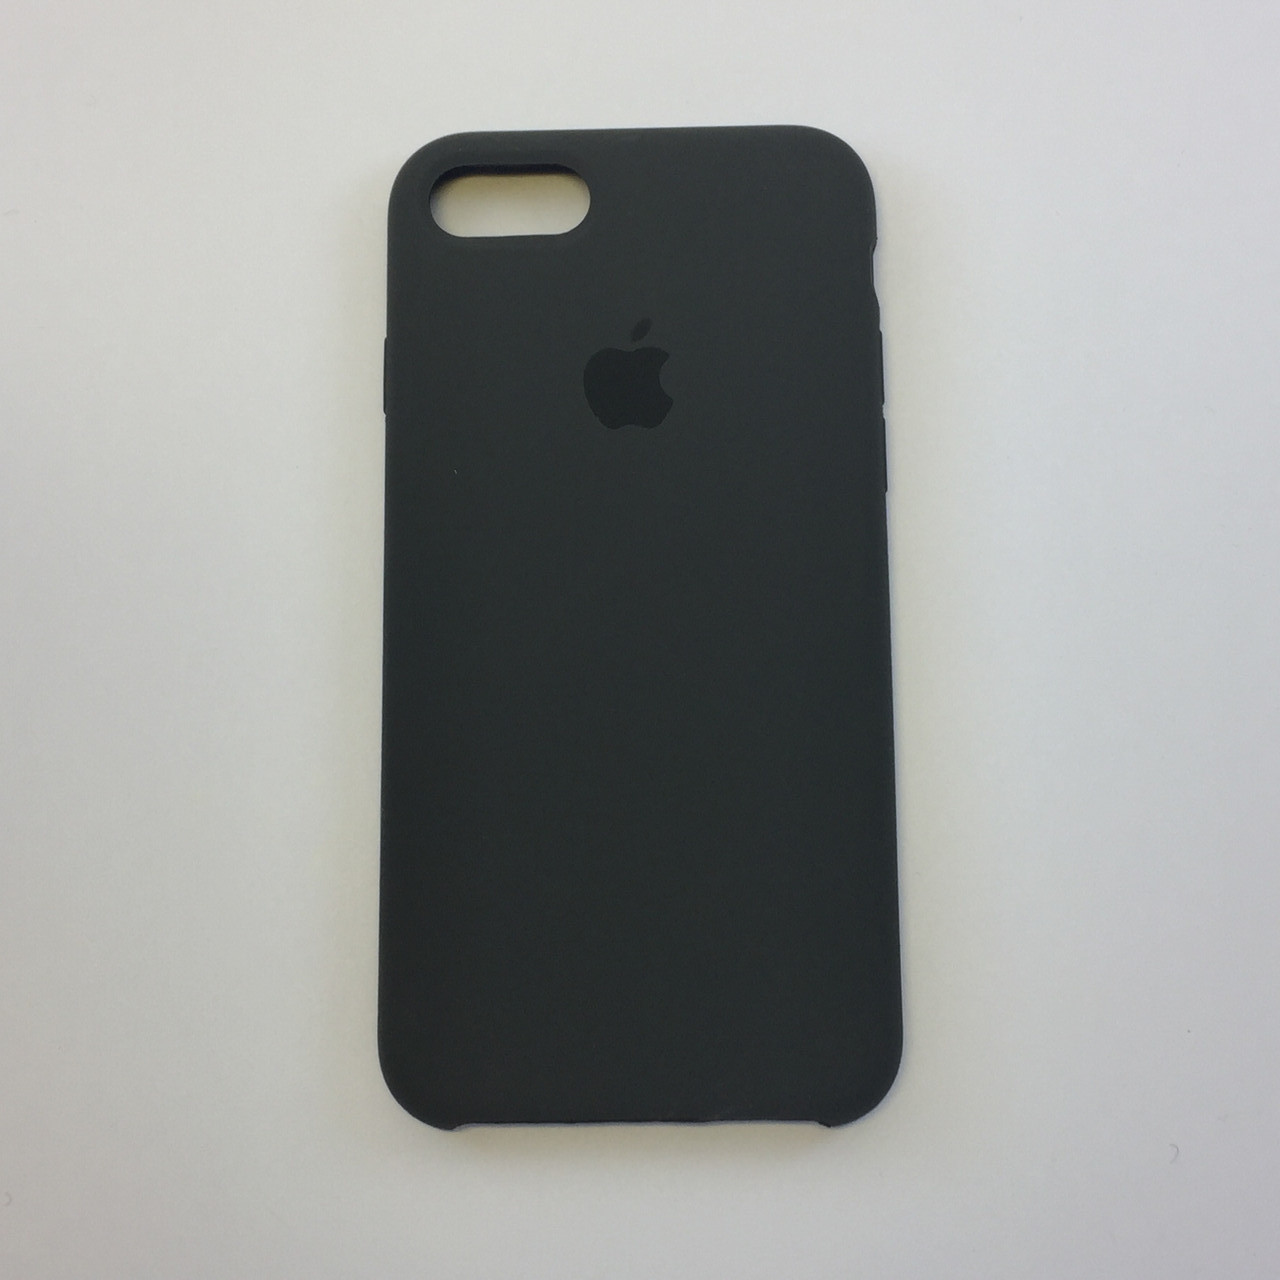 "Чехол - Silicon Case для iPhone ""Темно-коричневый - №22"" - copy orig."